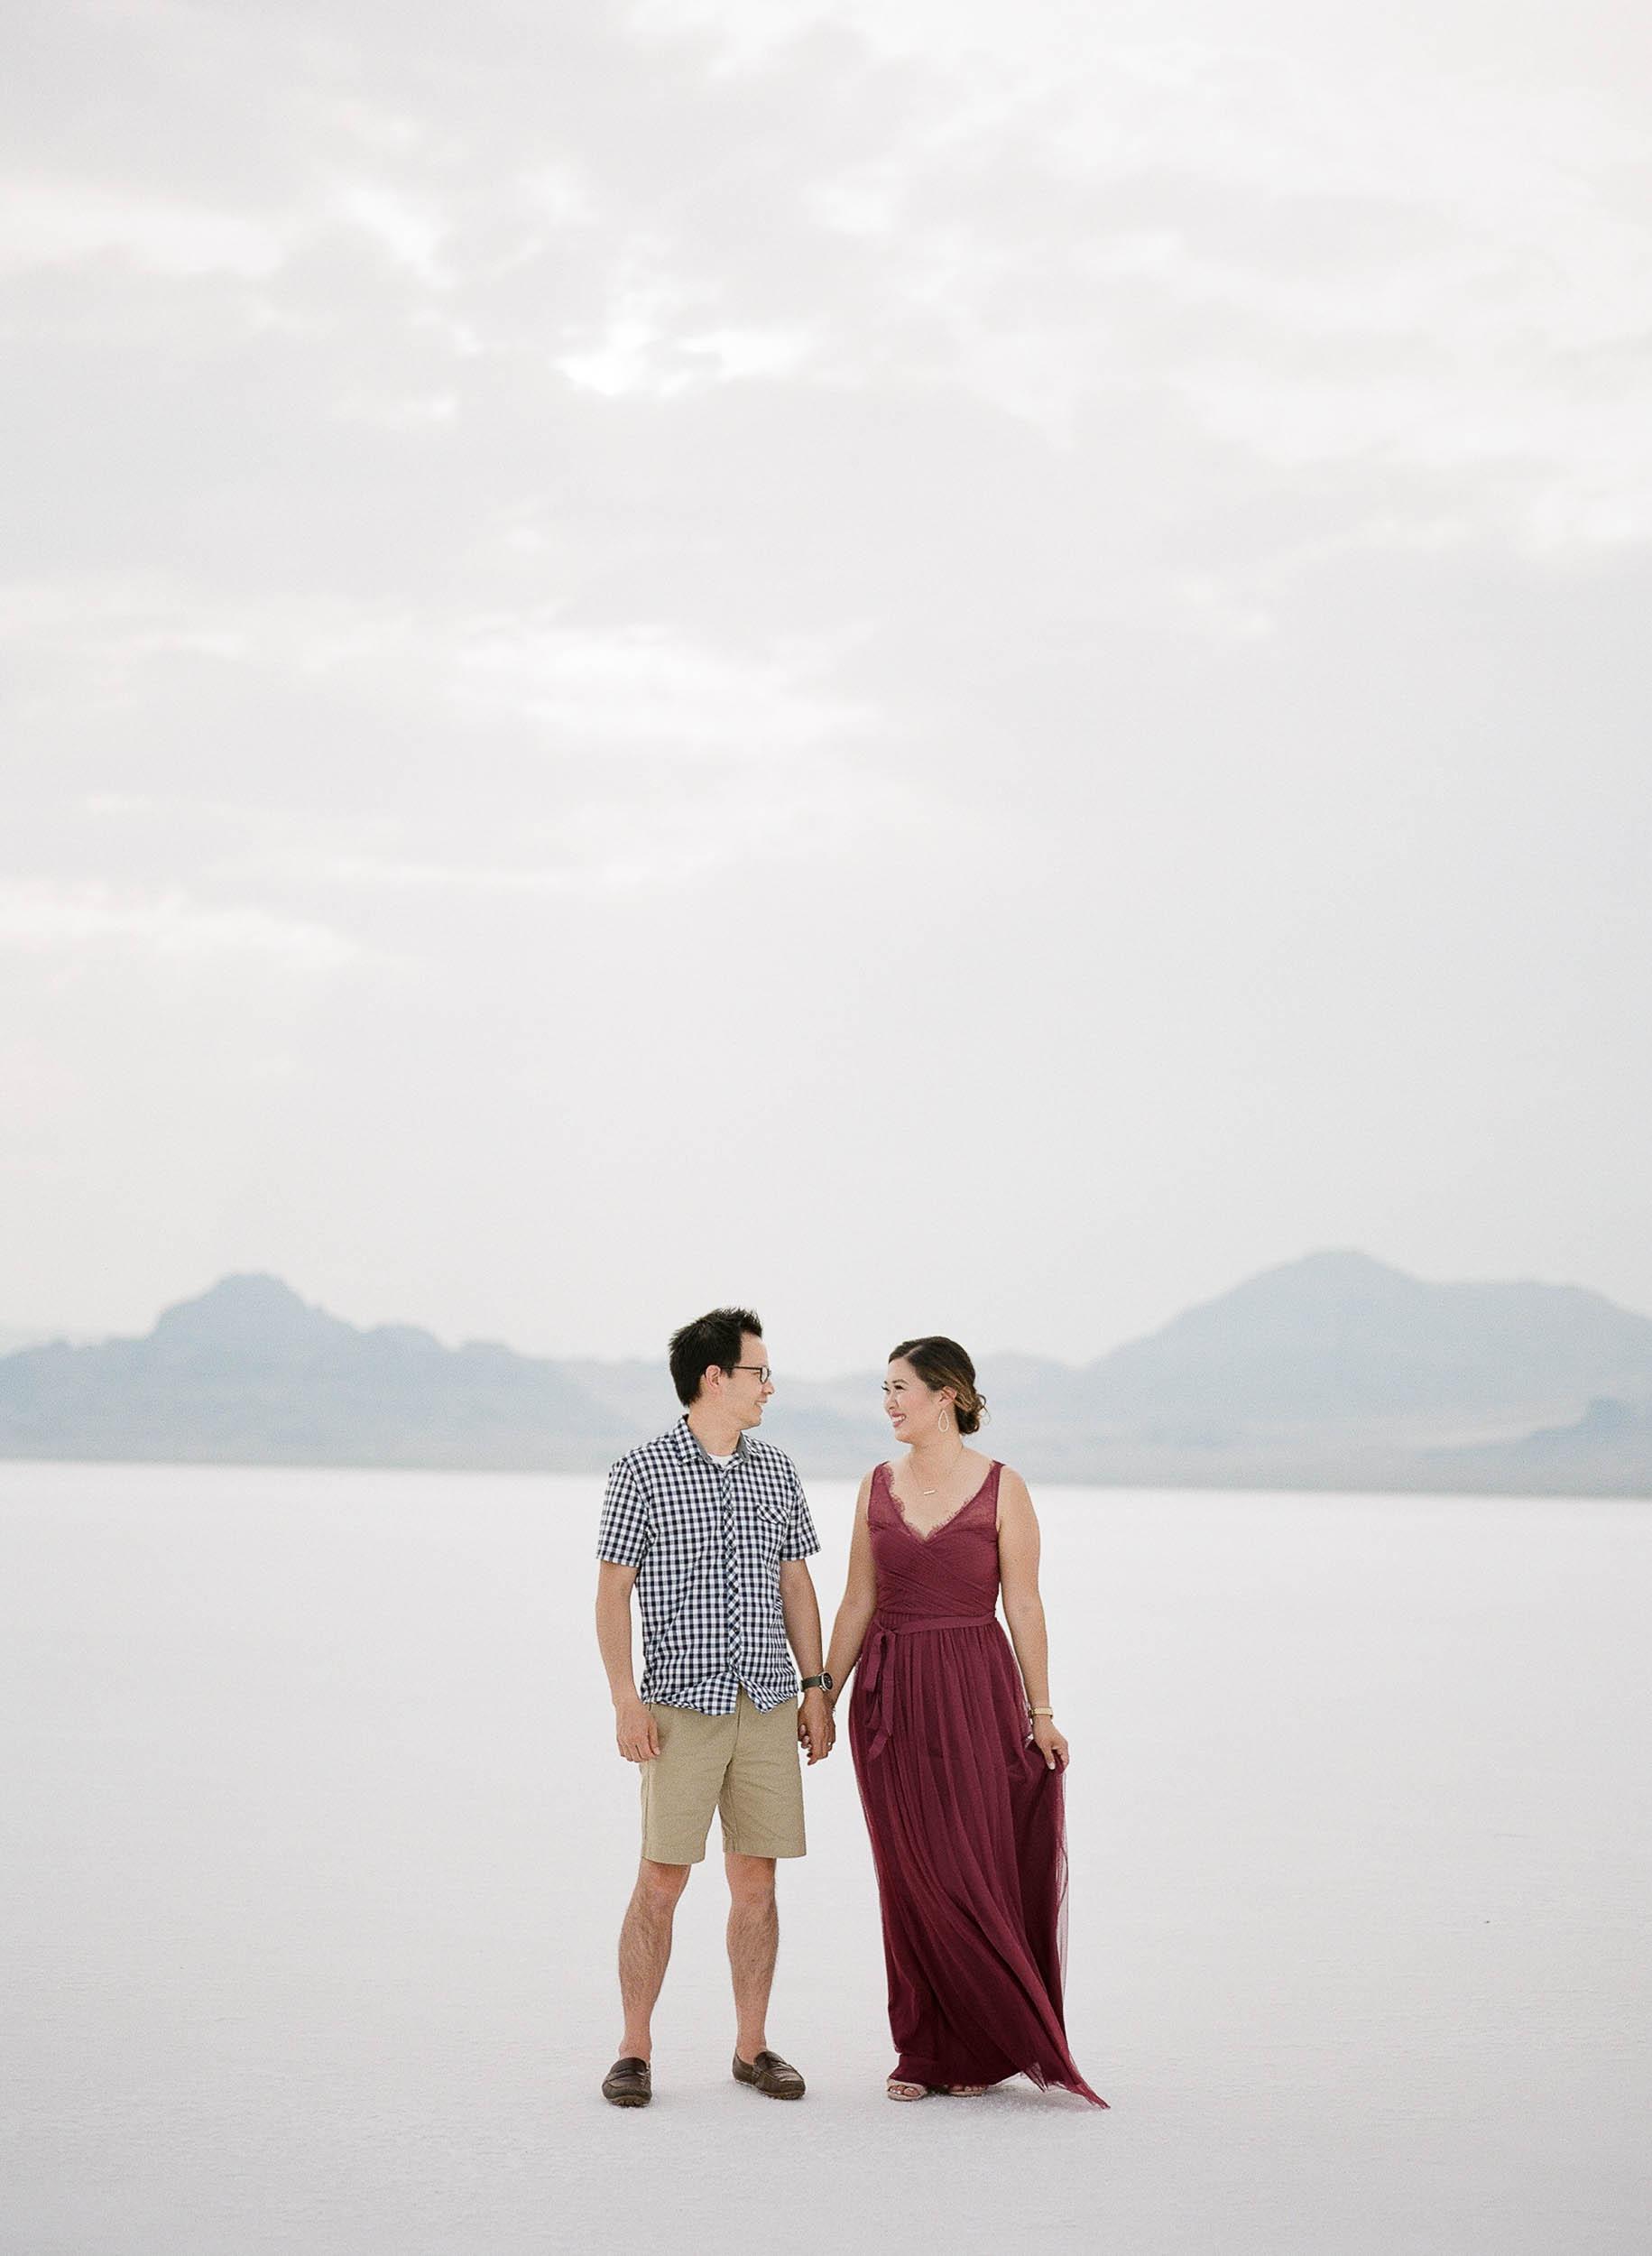 070918_Sandy A La Mode_Family_Utah Salt Flats_Buena Lane Photography_F400_91.jpg